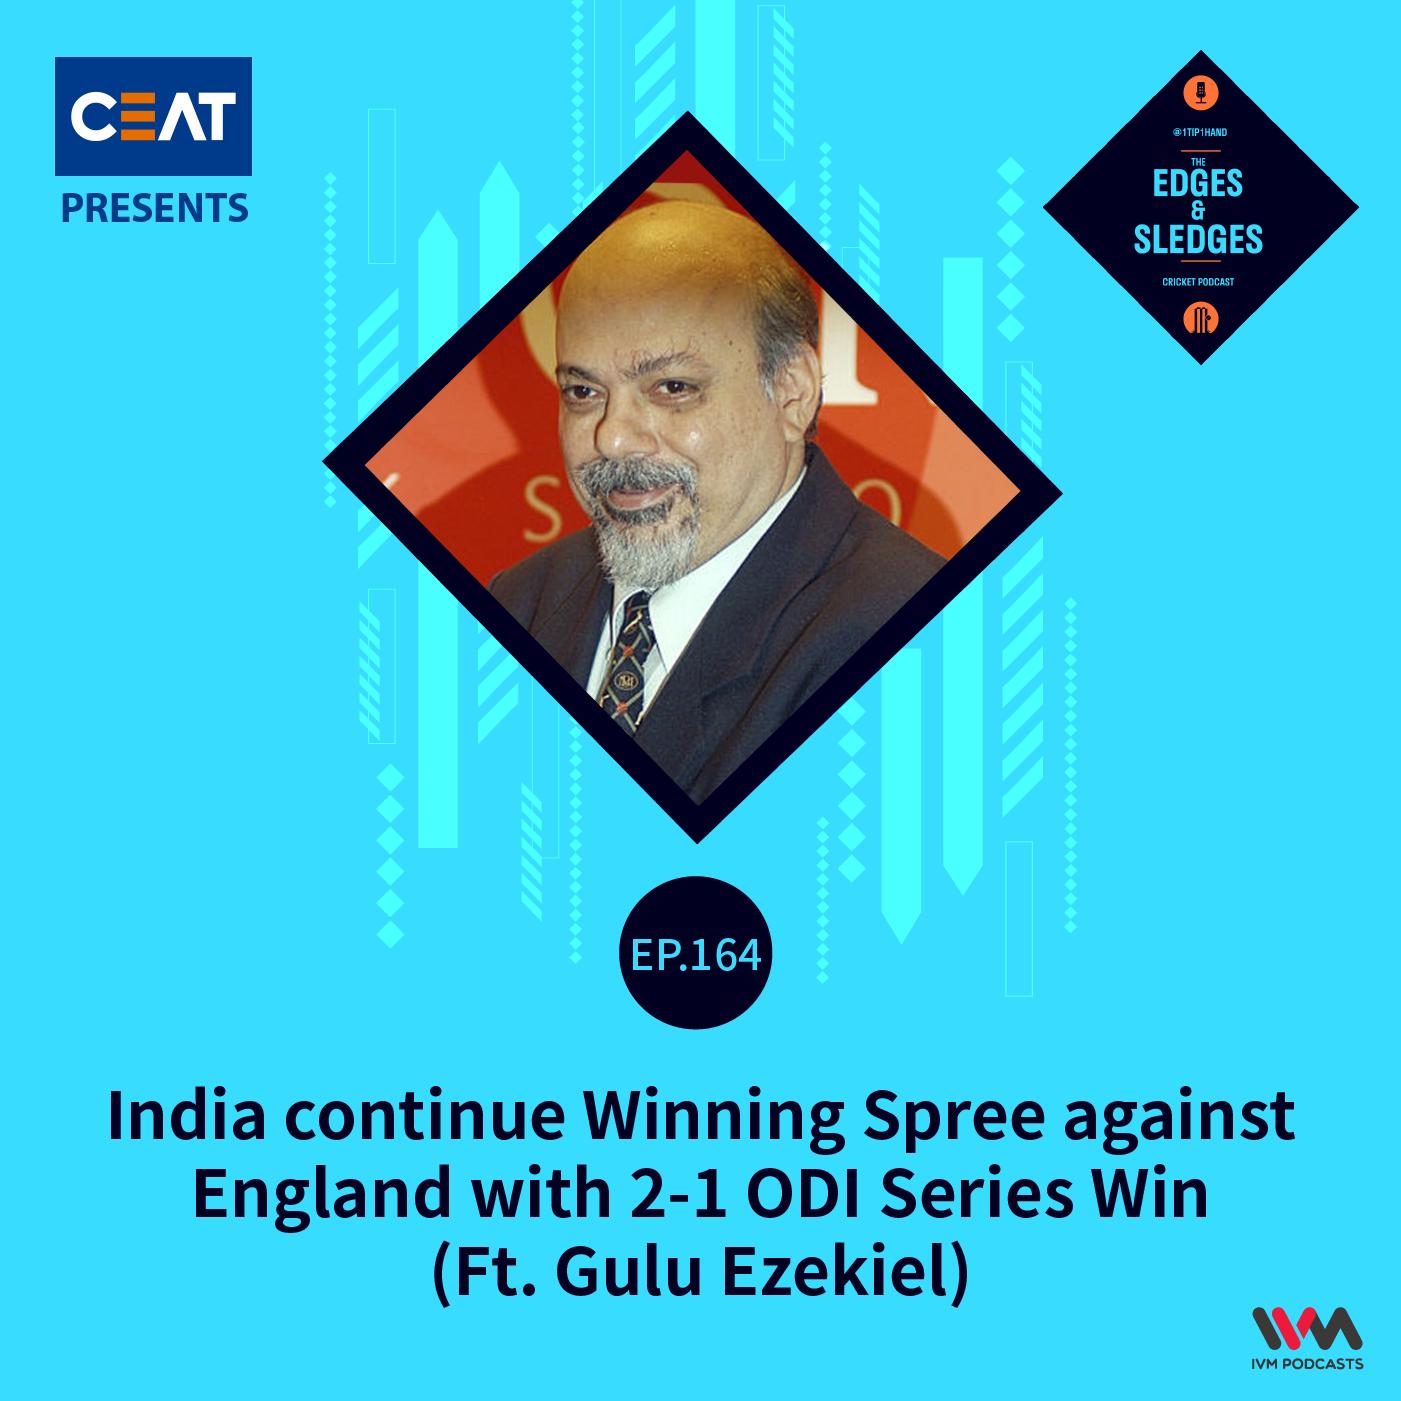 Ep. 164: India continue Winning Spree against England with 2-1 ODI Series Win (ft. Gulu Ezekiel)